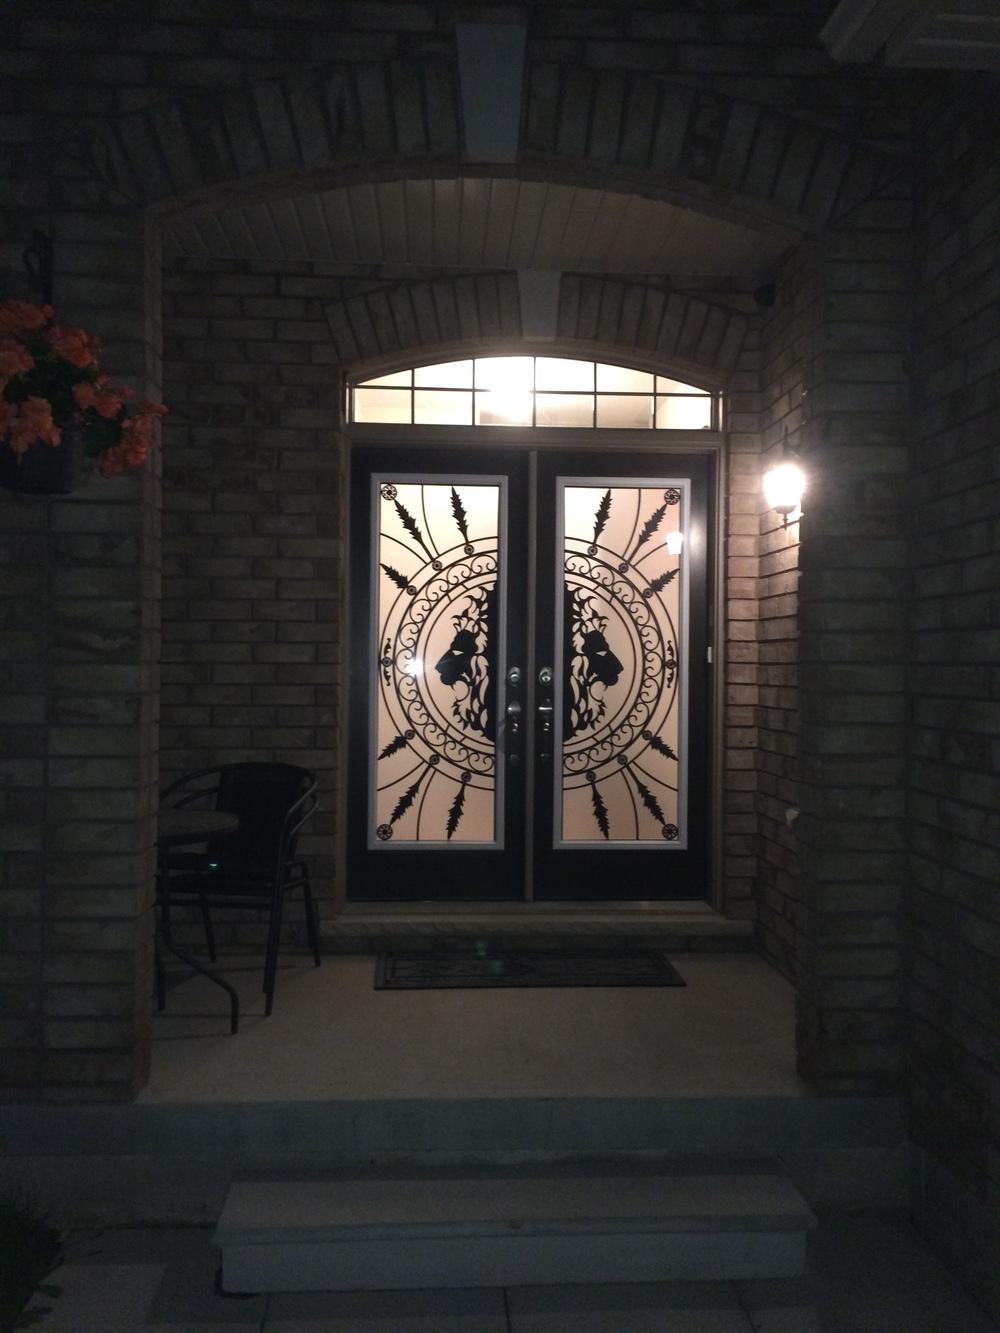 Forest-King-Wrought-Iron-Glass-Door-Inserts-Milton-ontario